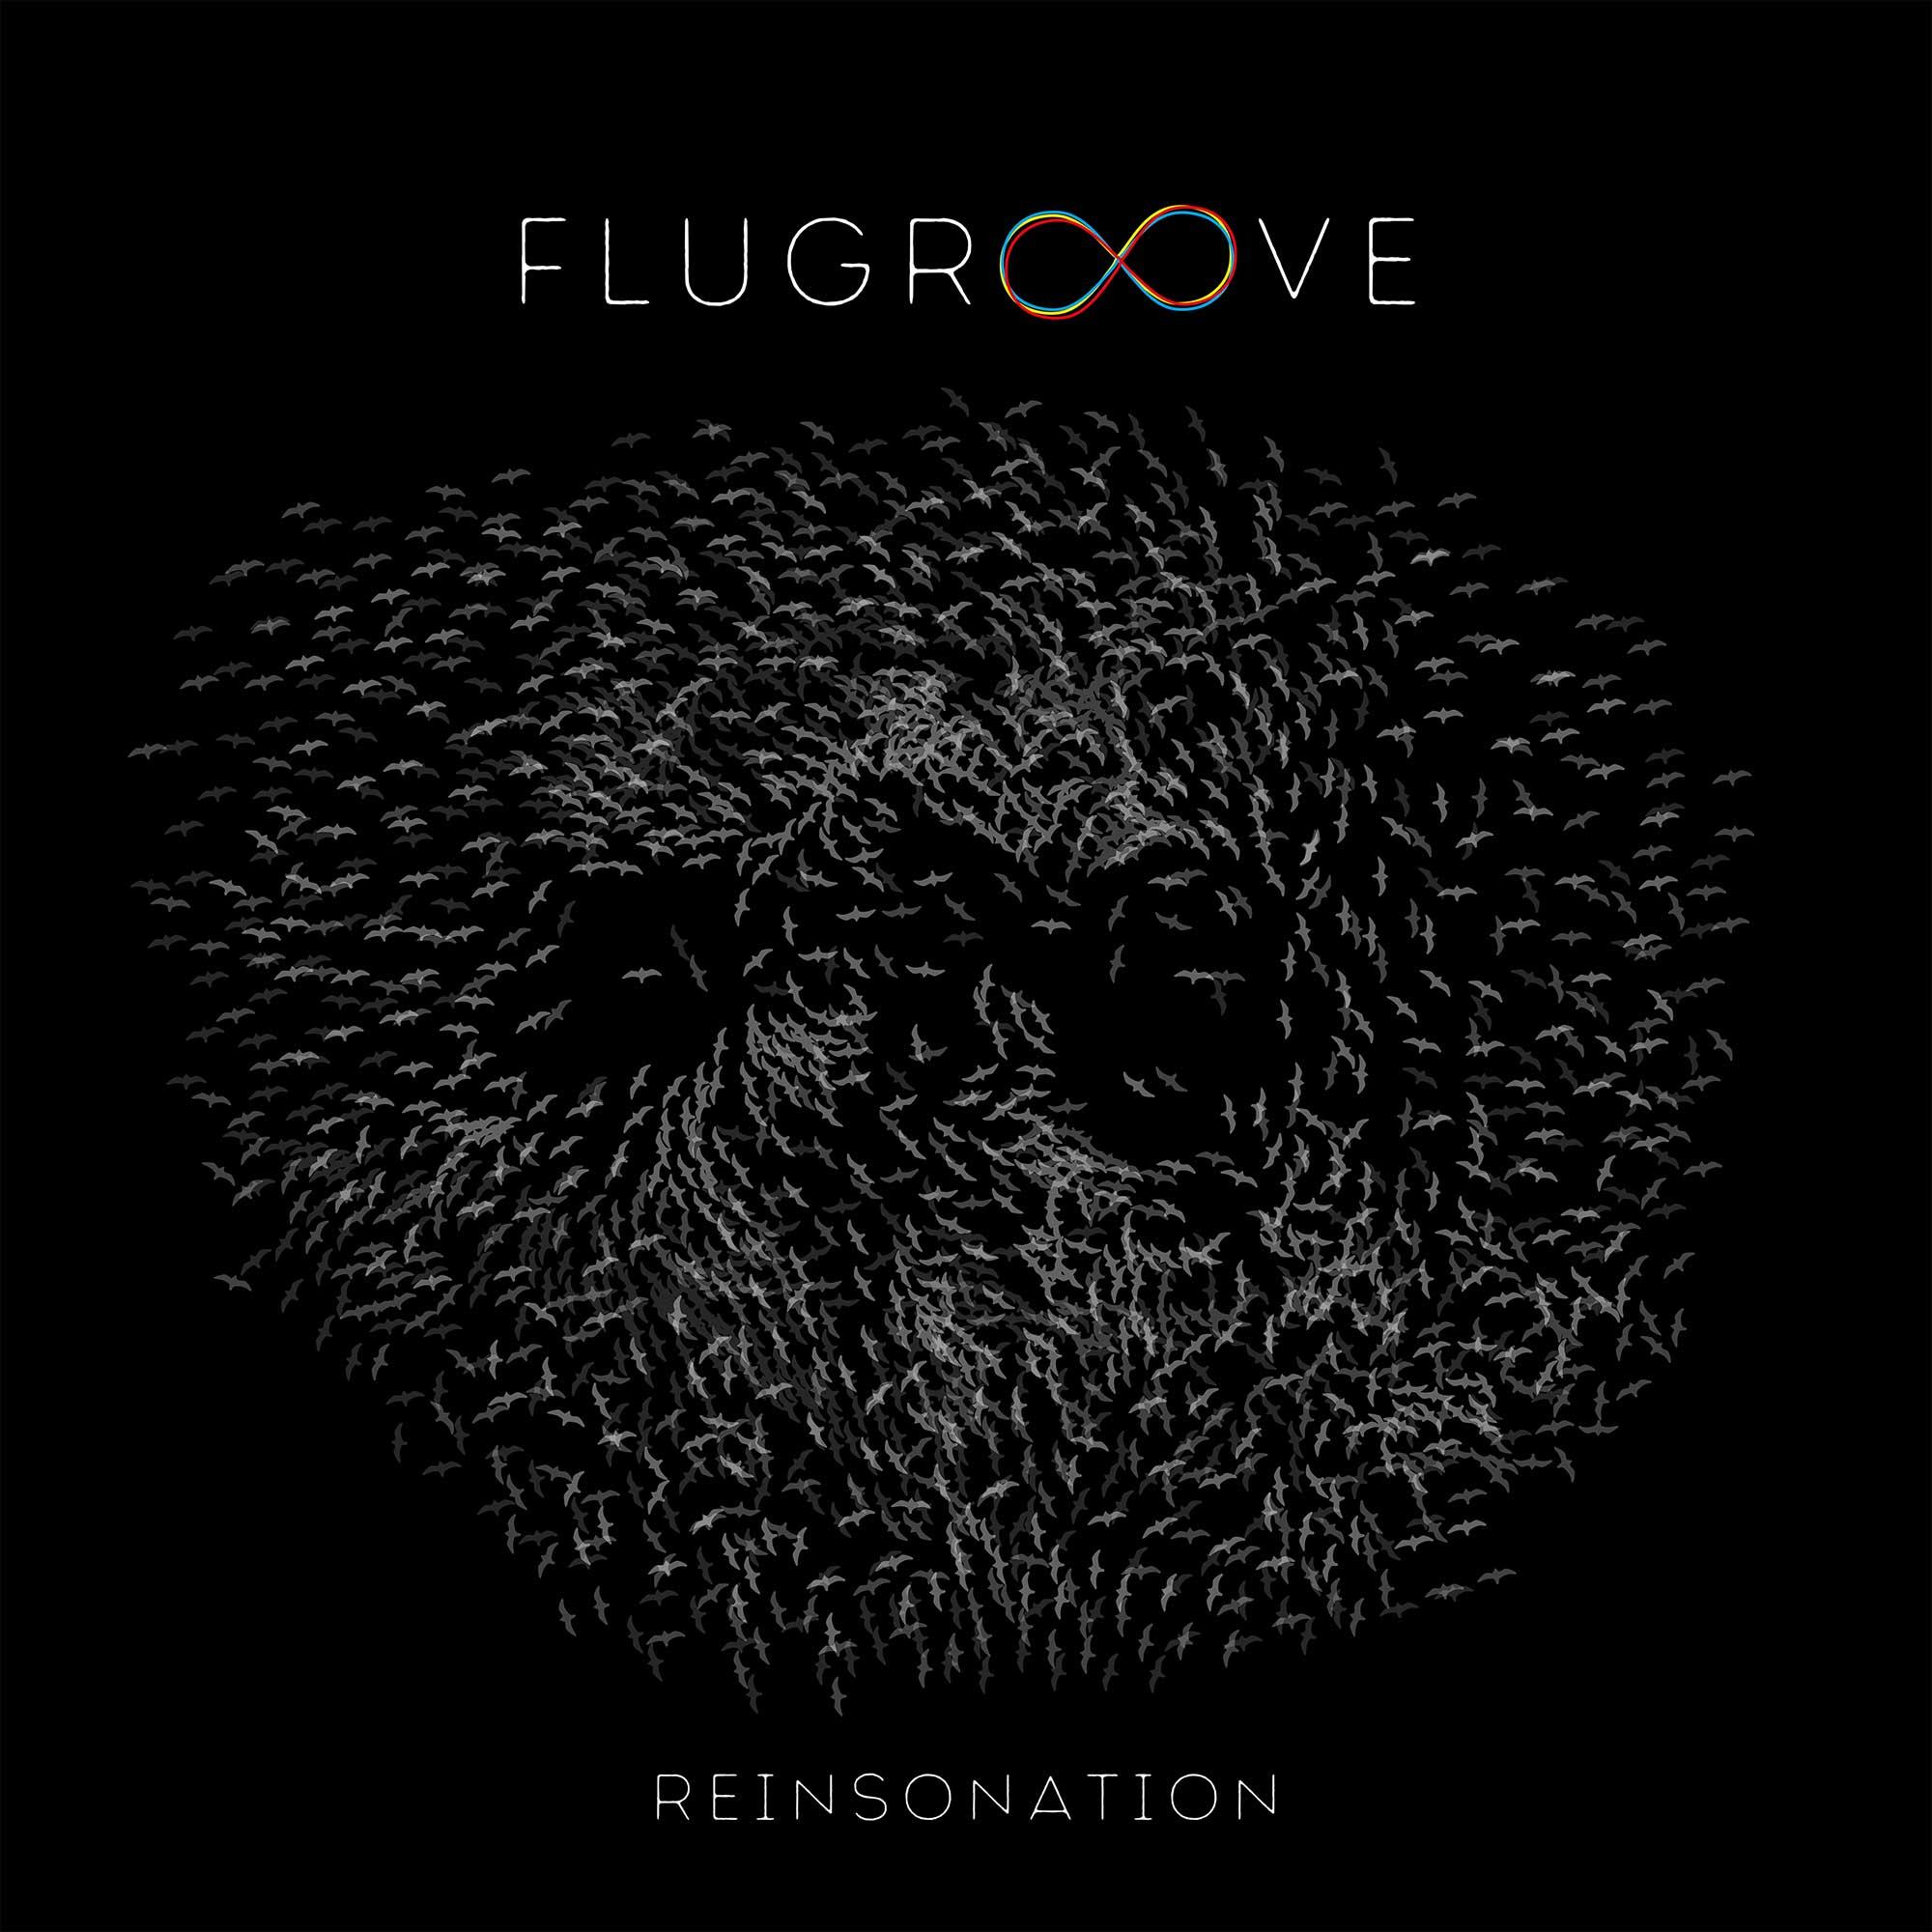 F L U G R O O V E - Dutch Ambient Indietronics | Reinsonation